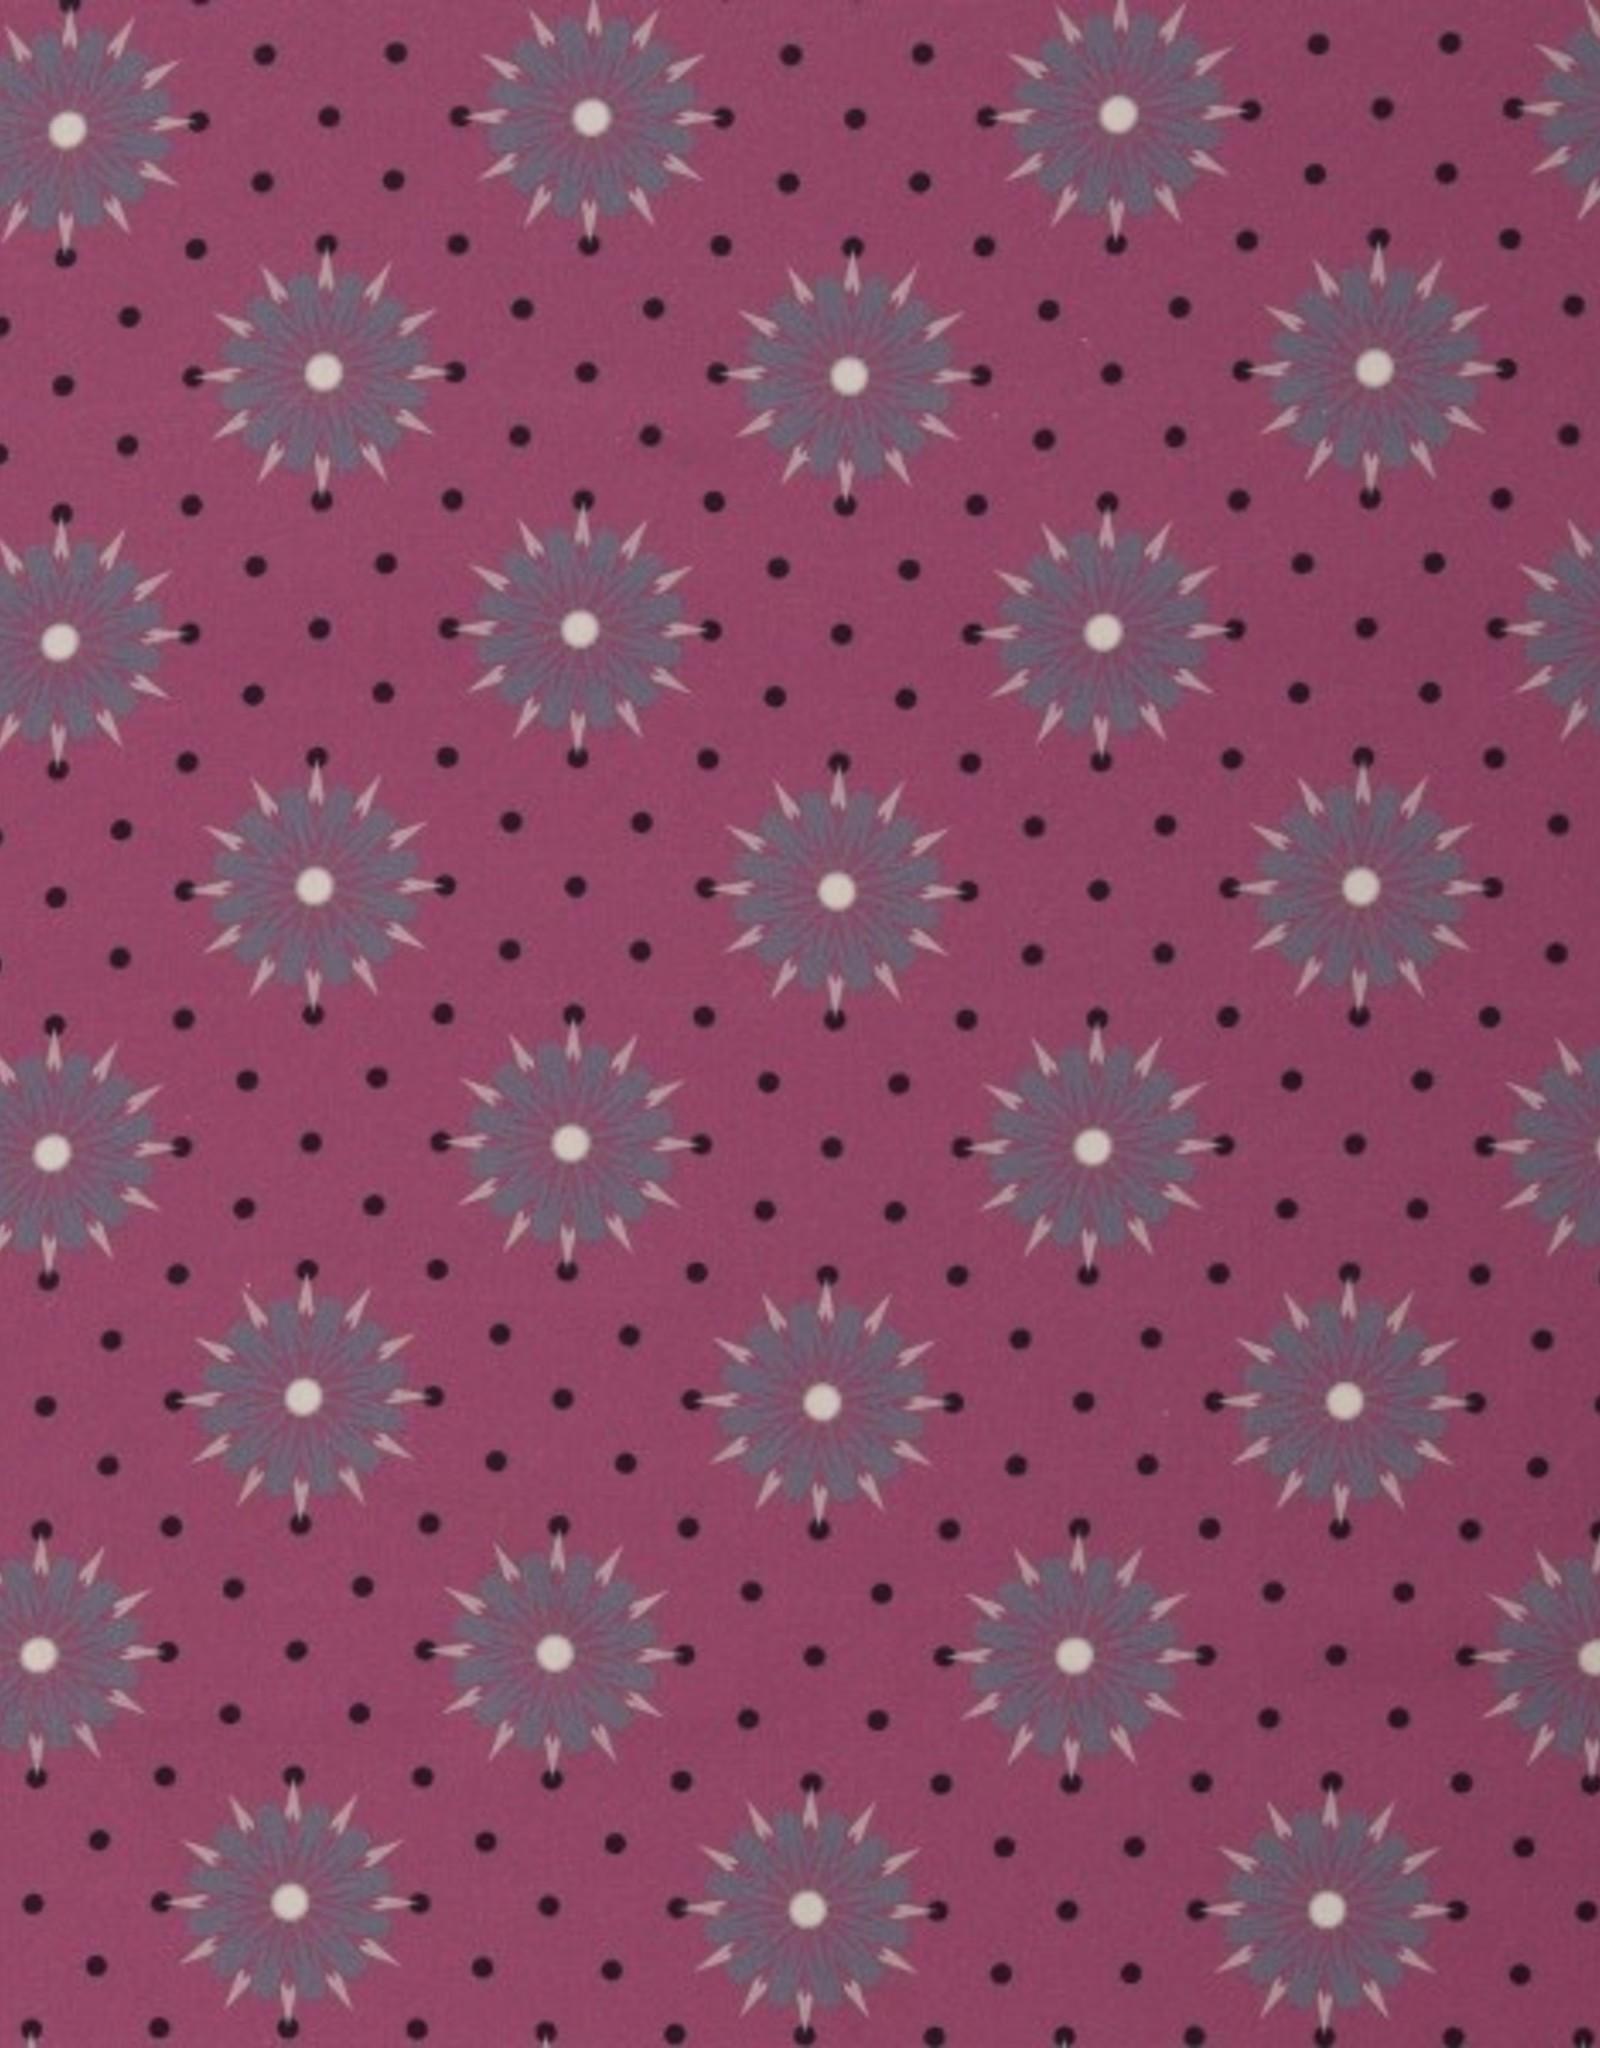 Fuchsia stars and dots